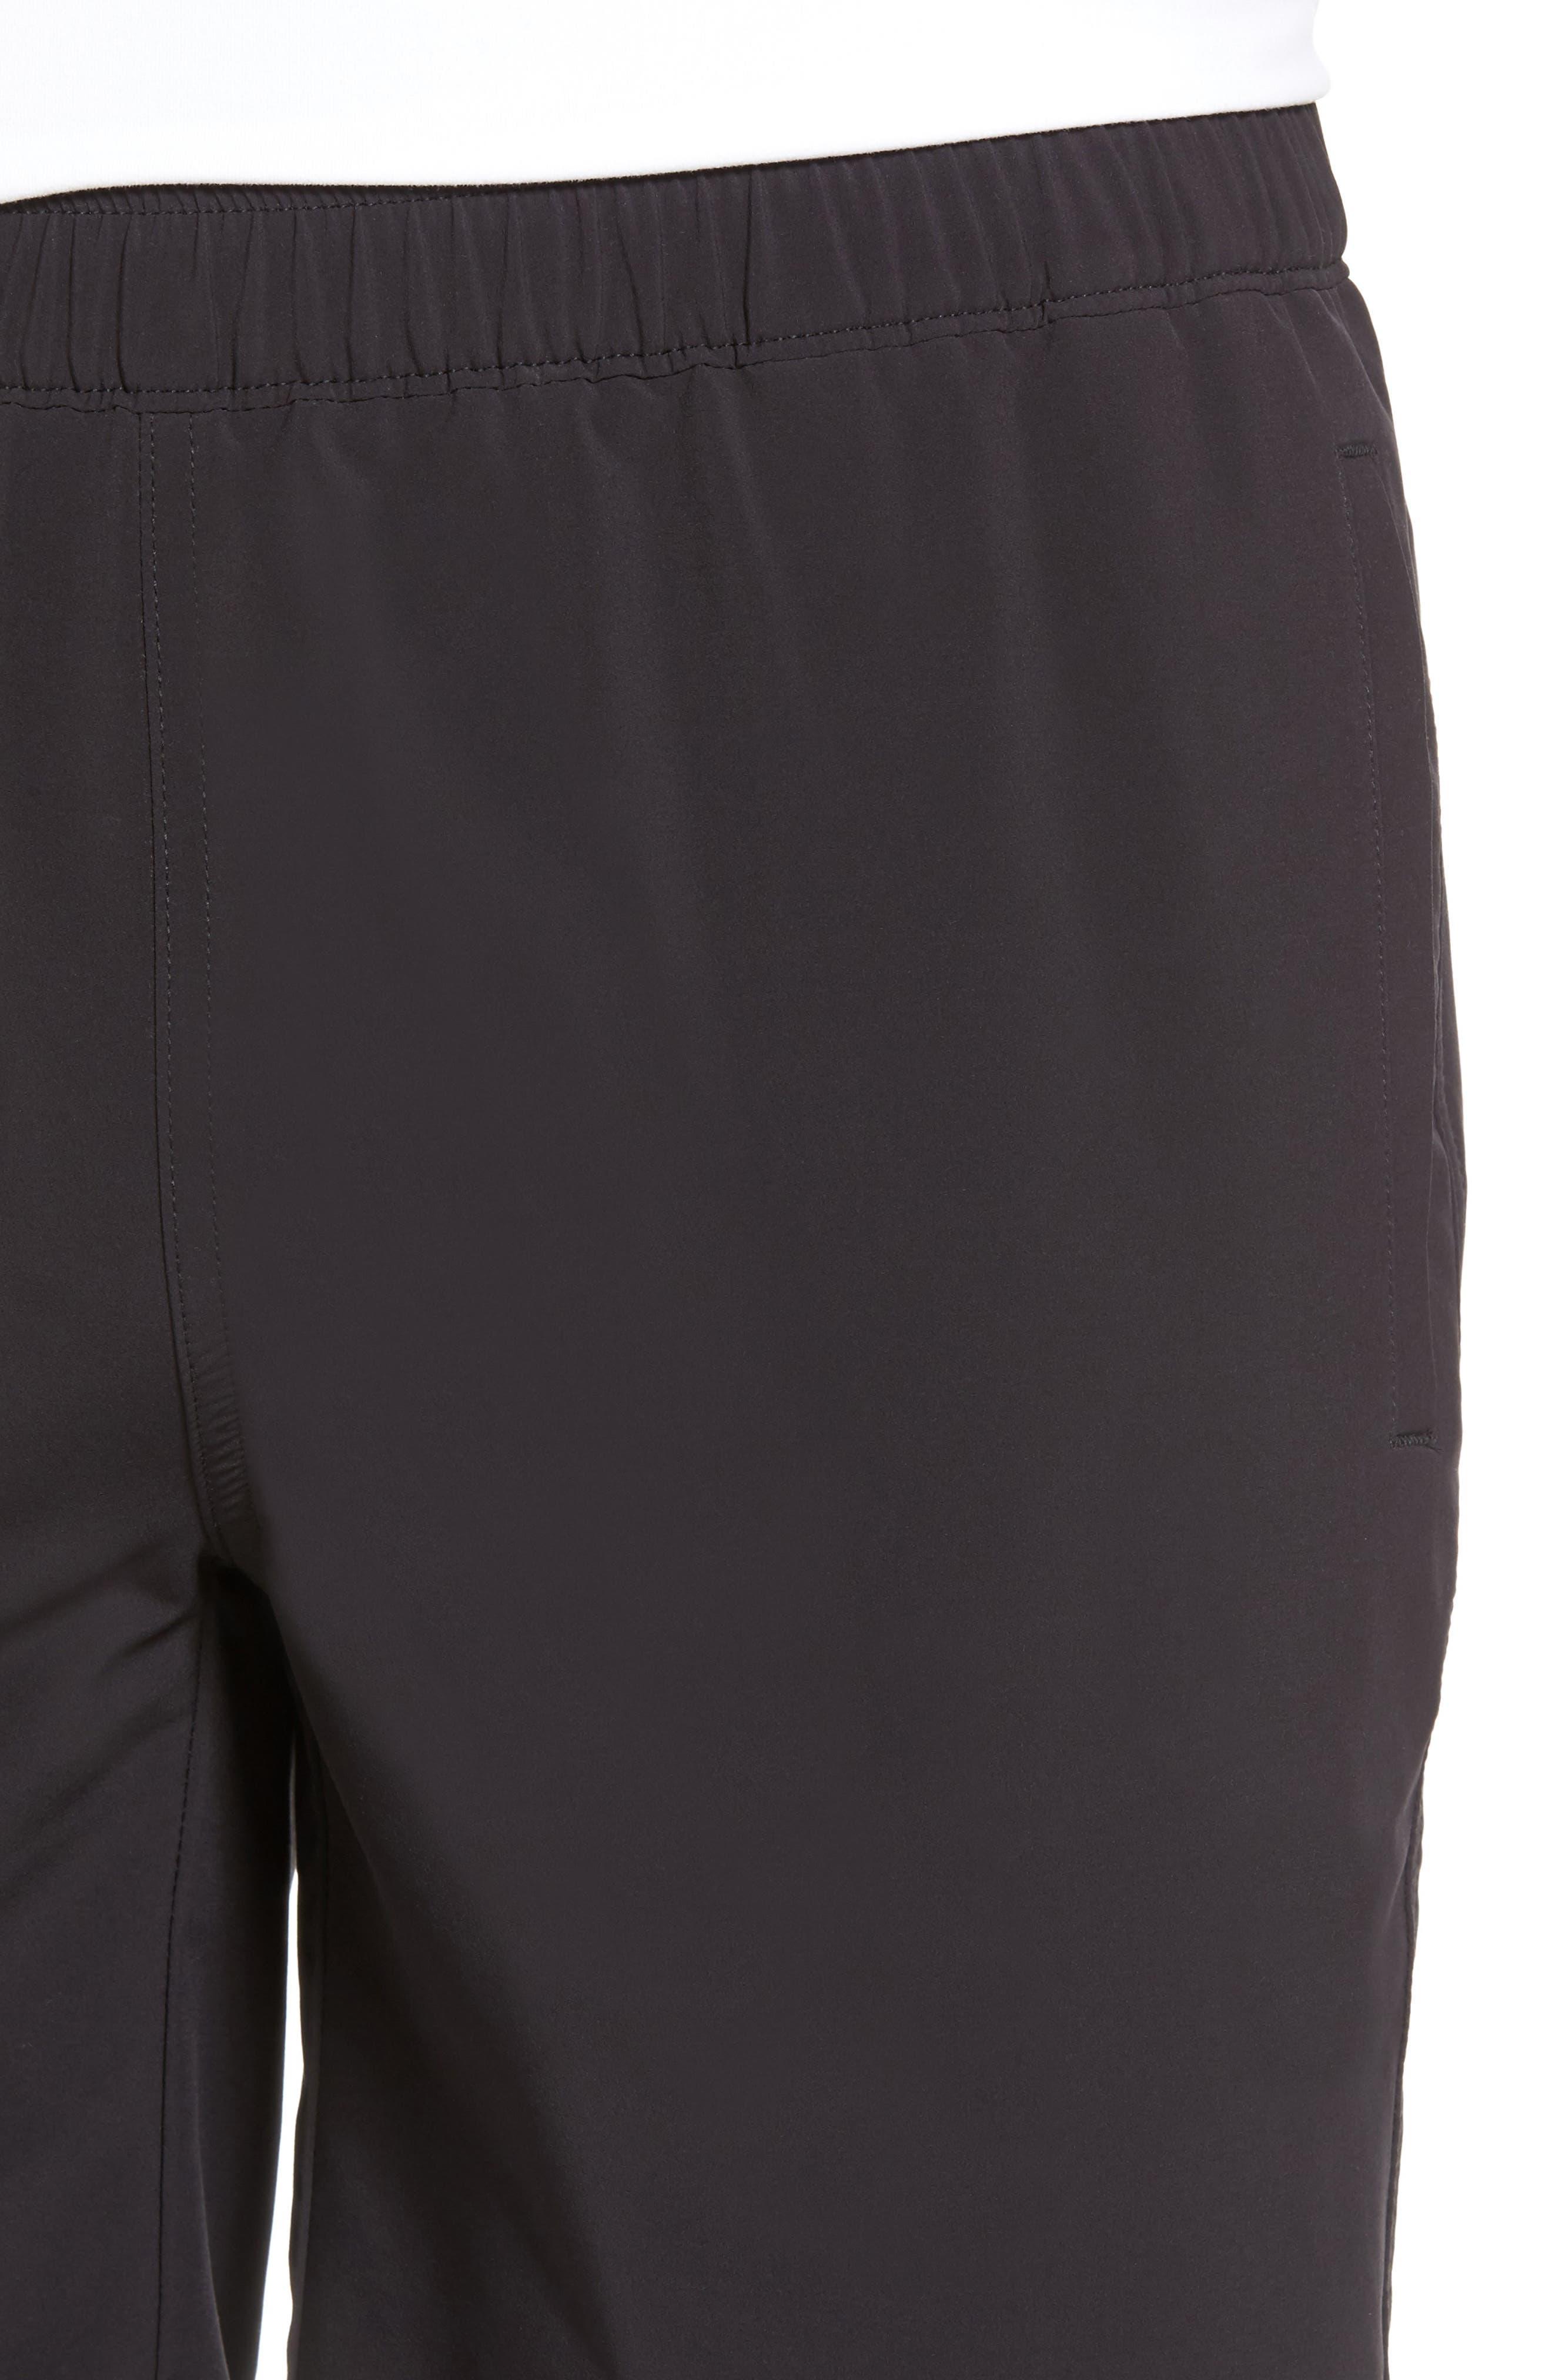 Oslo Sport Shorts,                             Alternate thumbnail 4, color,                             Black